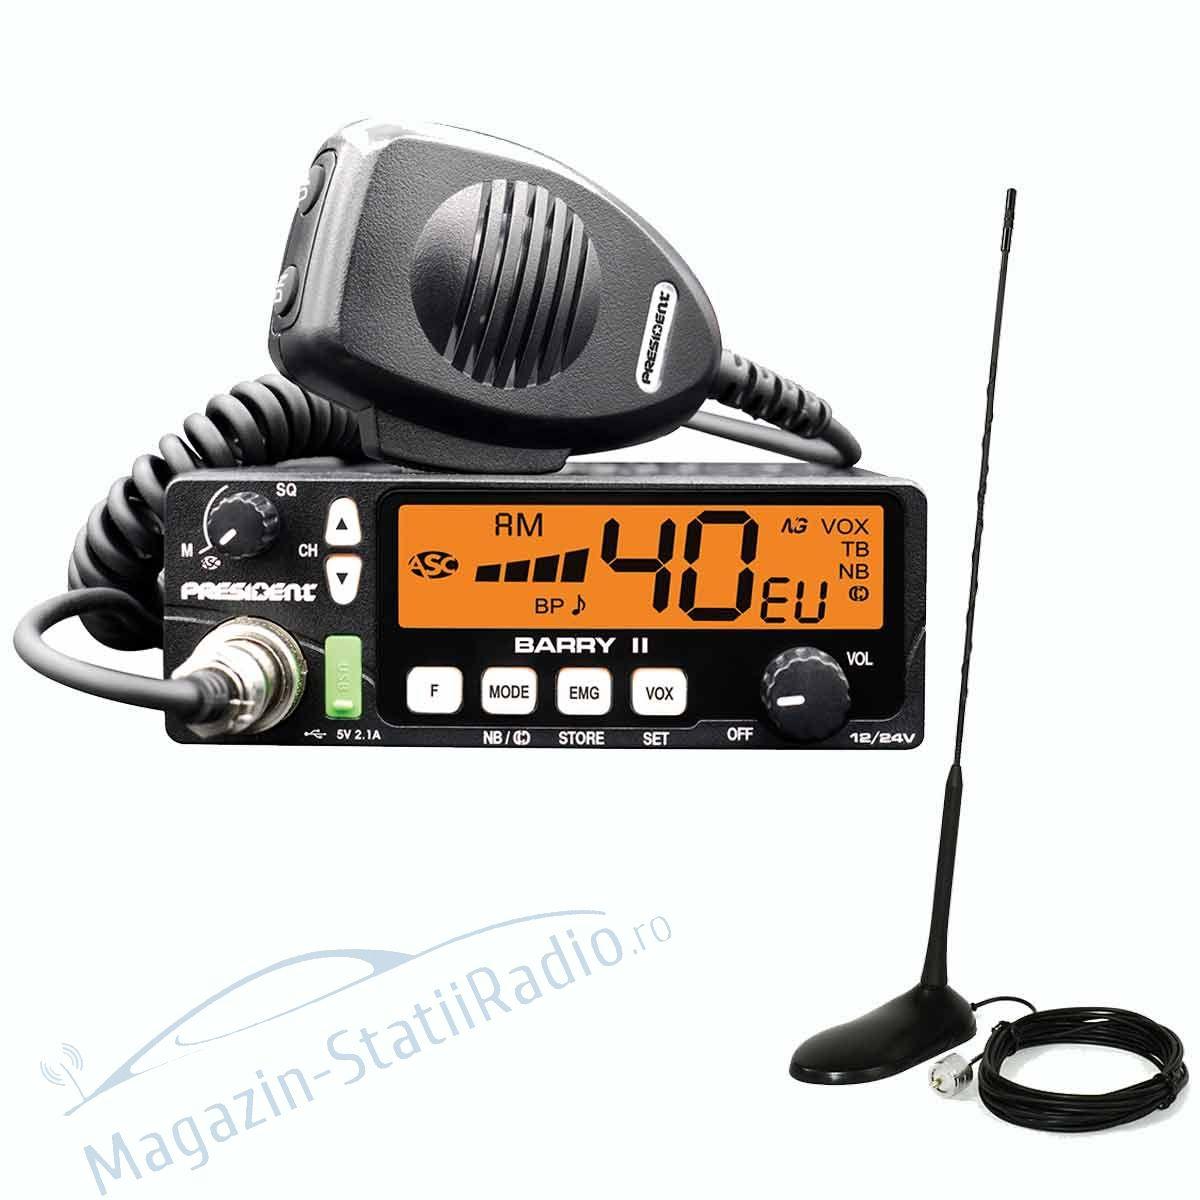 Statie Radio President Barry II AM/FM ASC, 12/24v + Antena CB PNI Extra 45